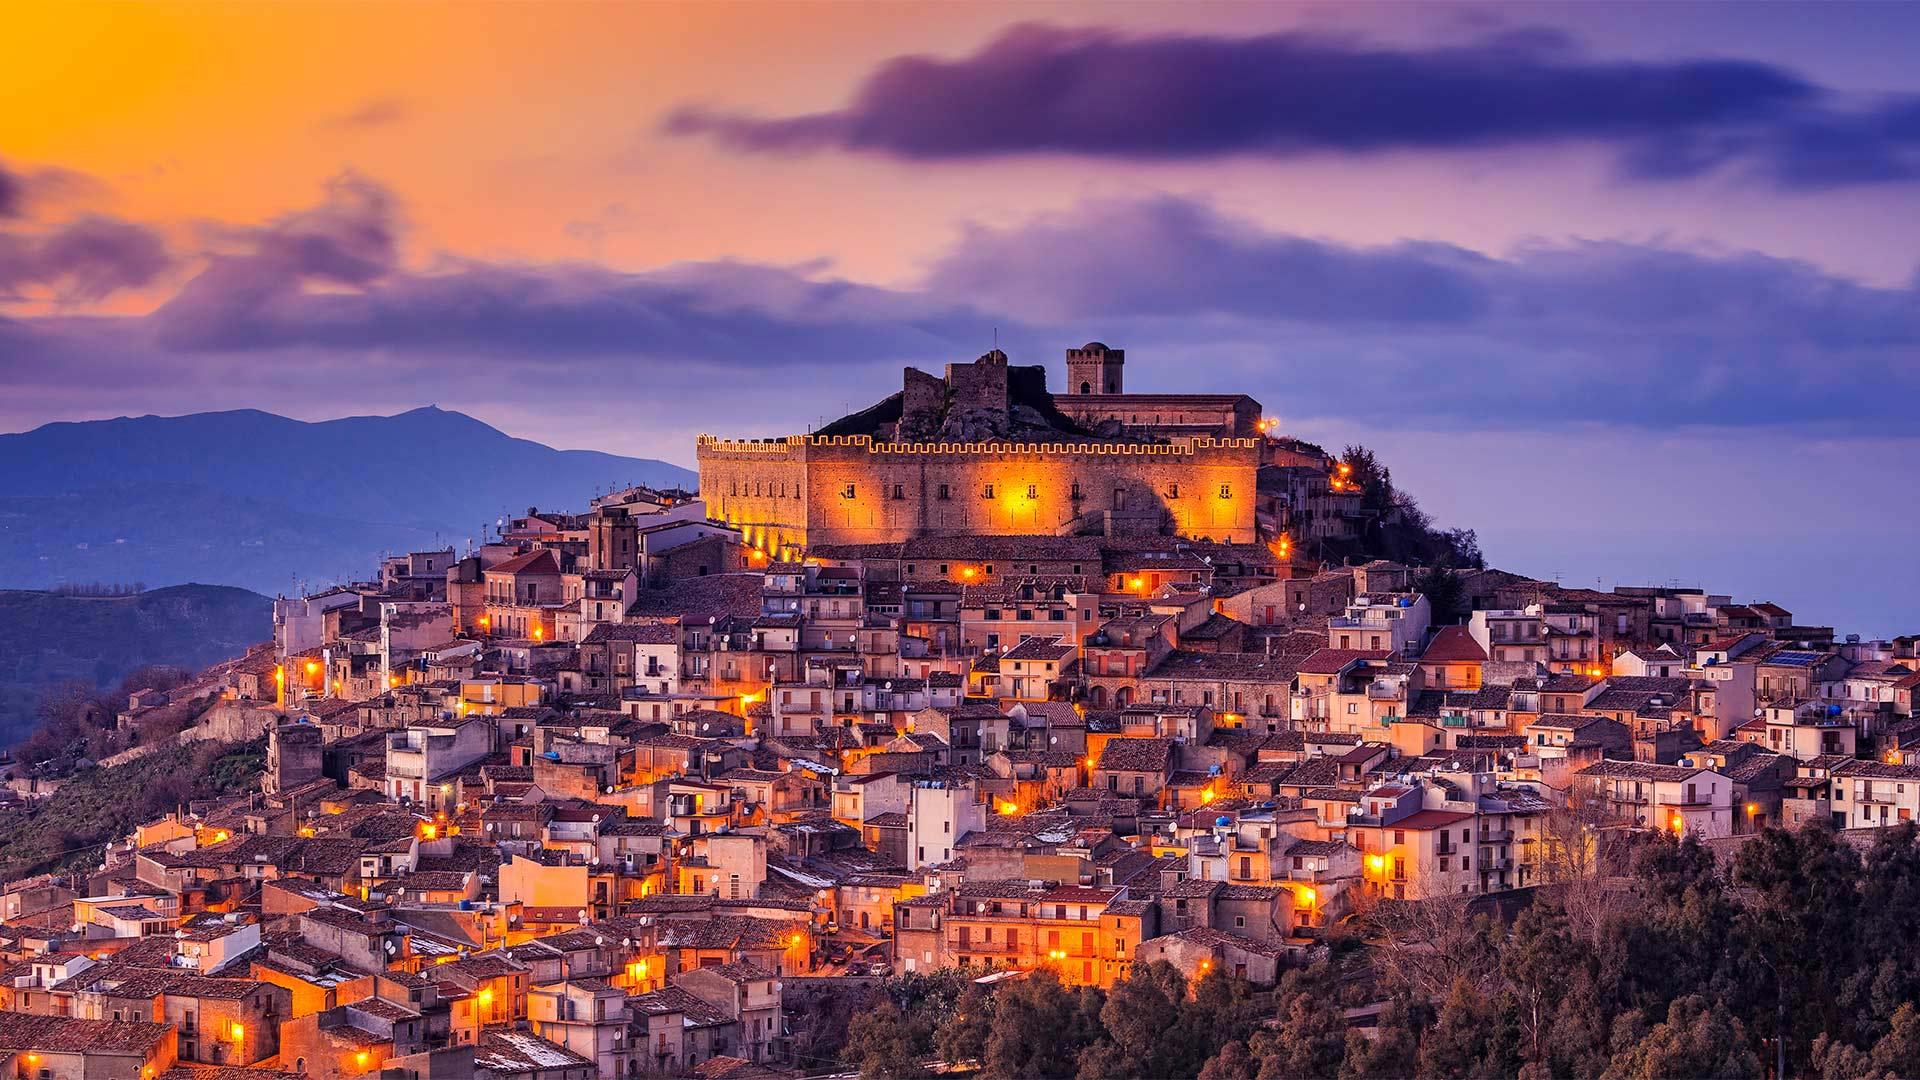 蒙塔尔巴诺埃利科纳,意大利西西里岛 (© Antonino Bartuccio/SOPA Collection/Offset by Shutterstock)